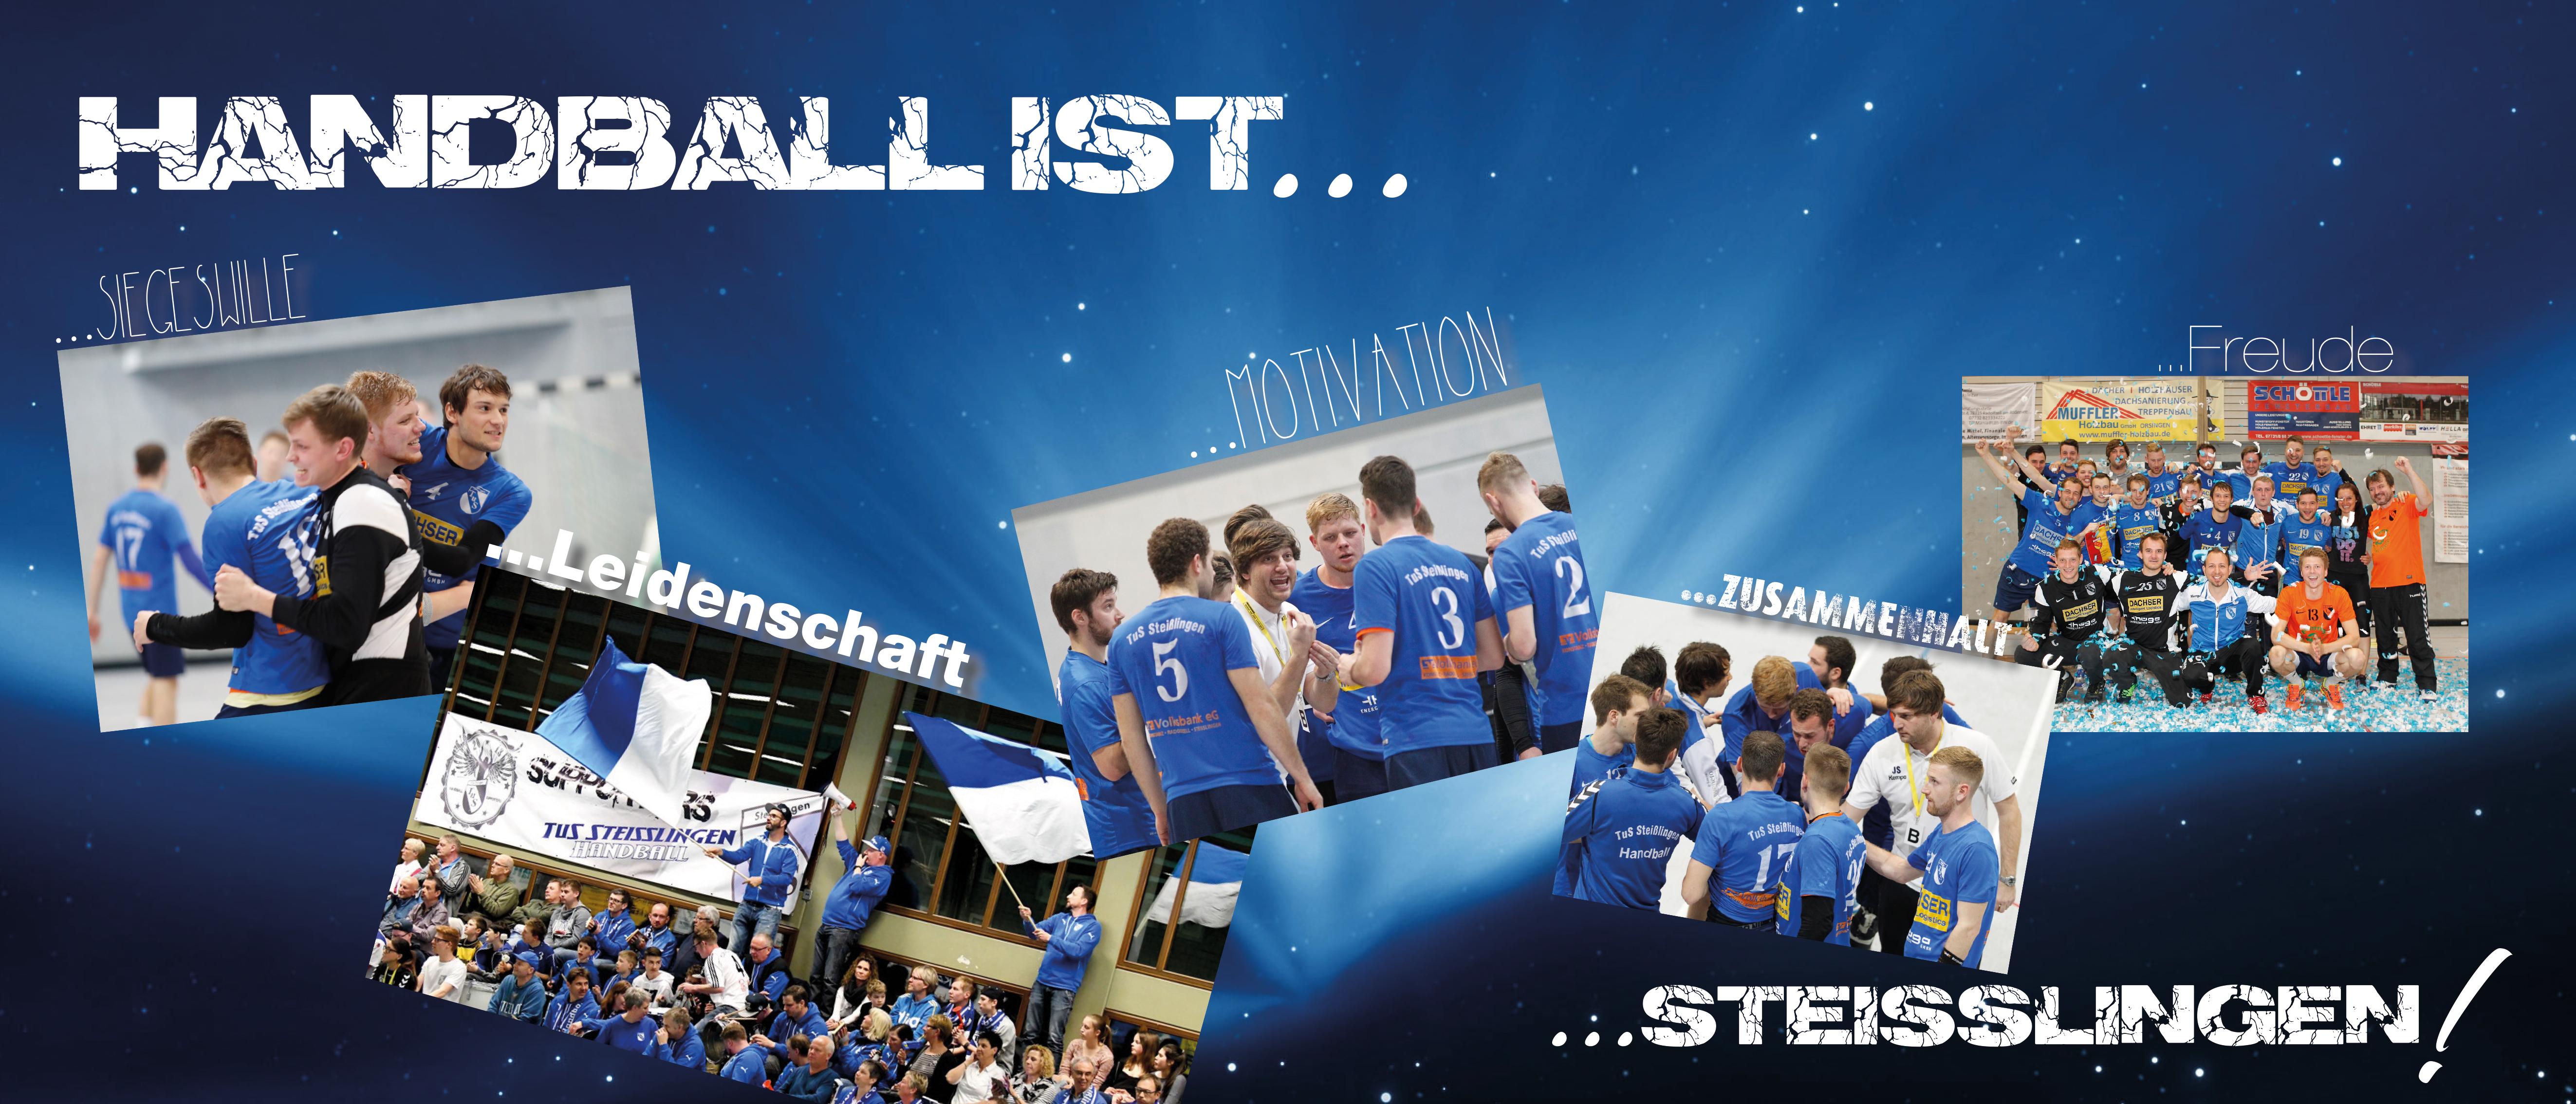 TuS-Seite_5291x2268_Handball-ist